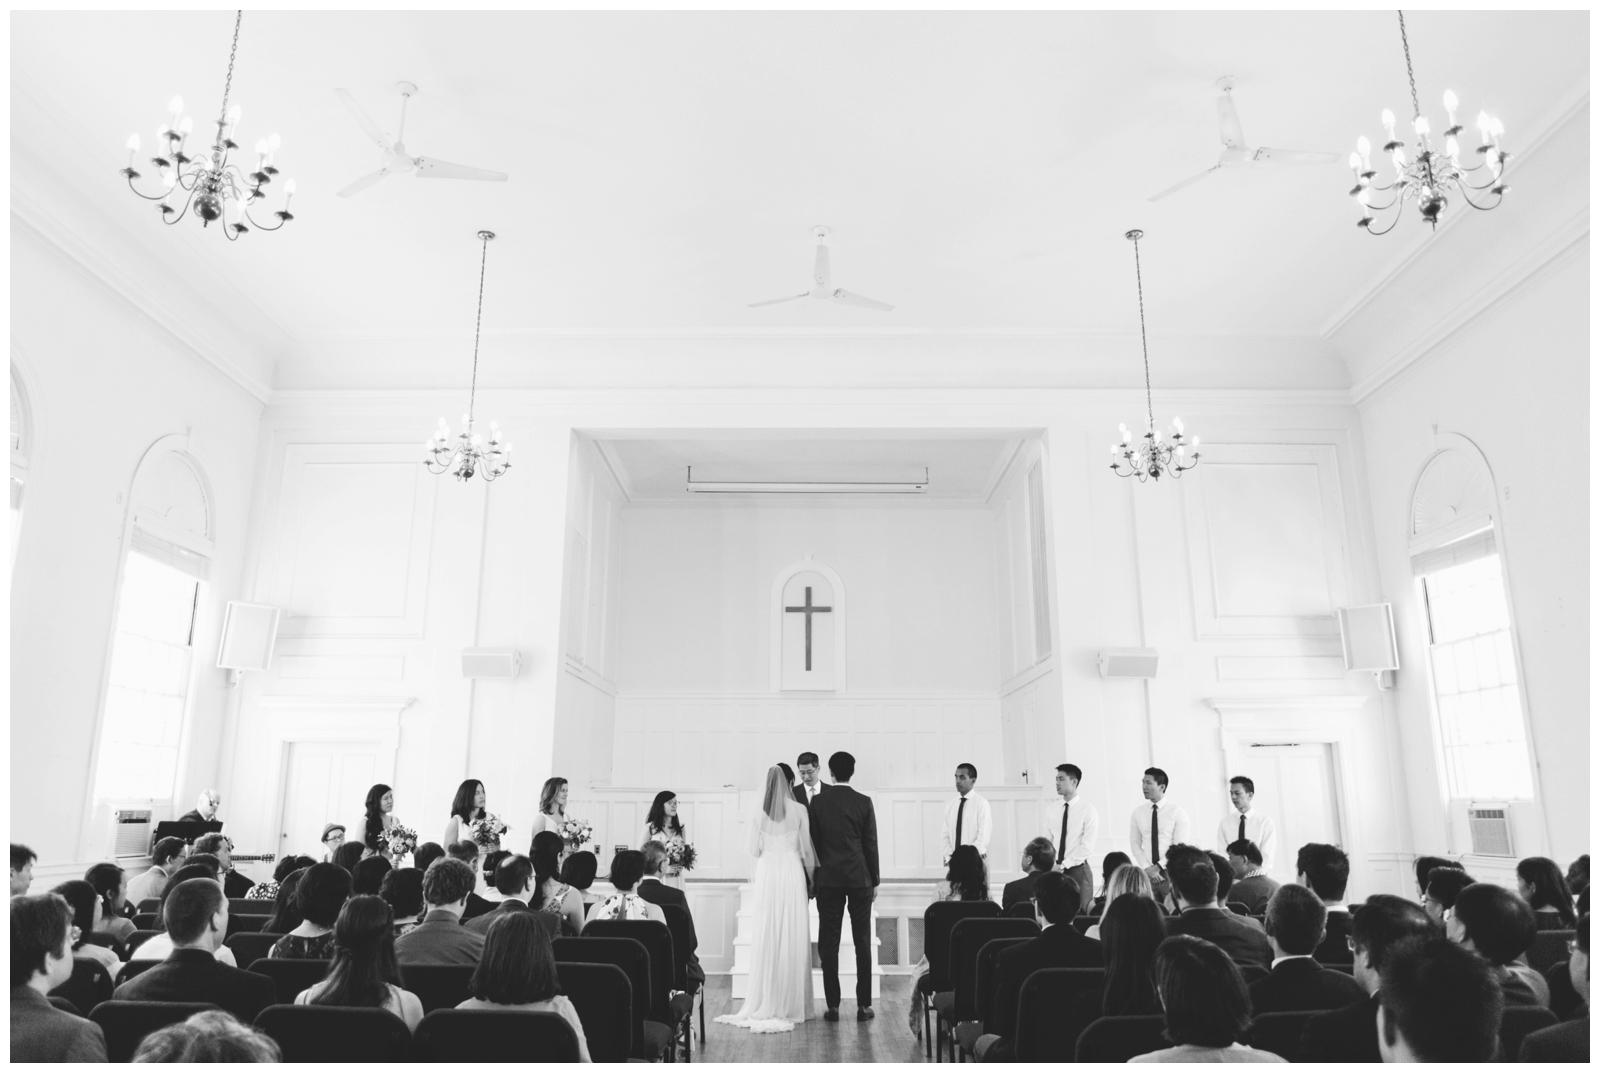 Samberg-Conference-Center-Boston-Wedding-Photographer-Bailey-Q-Photo-059.jpg